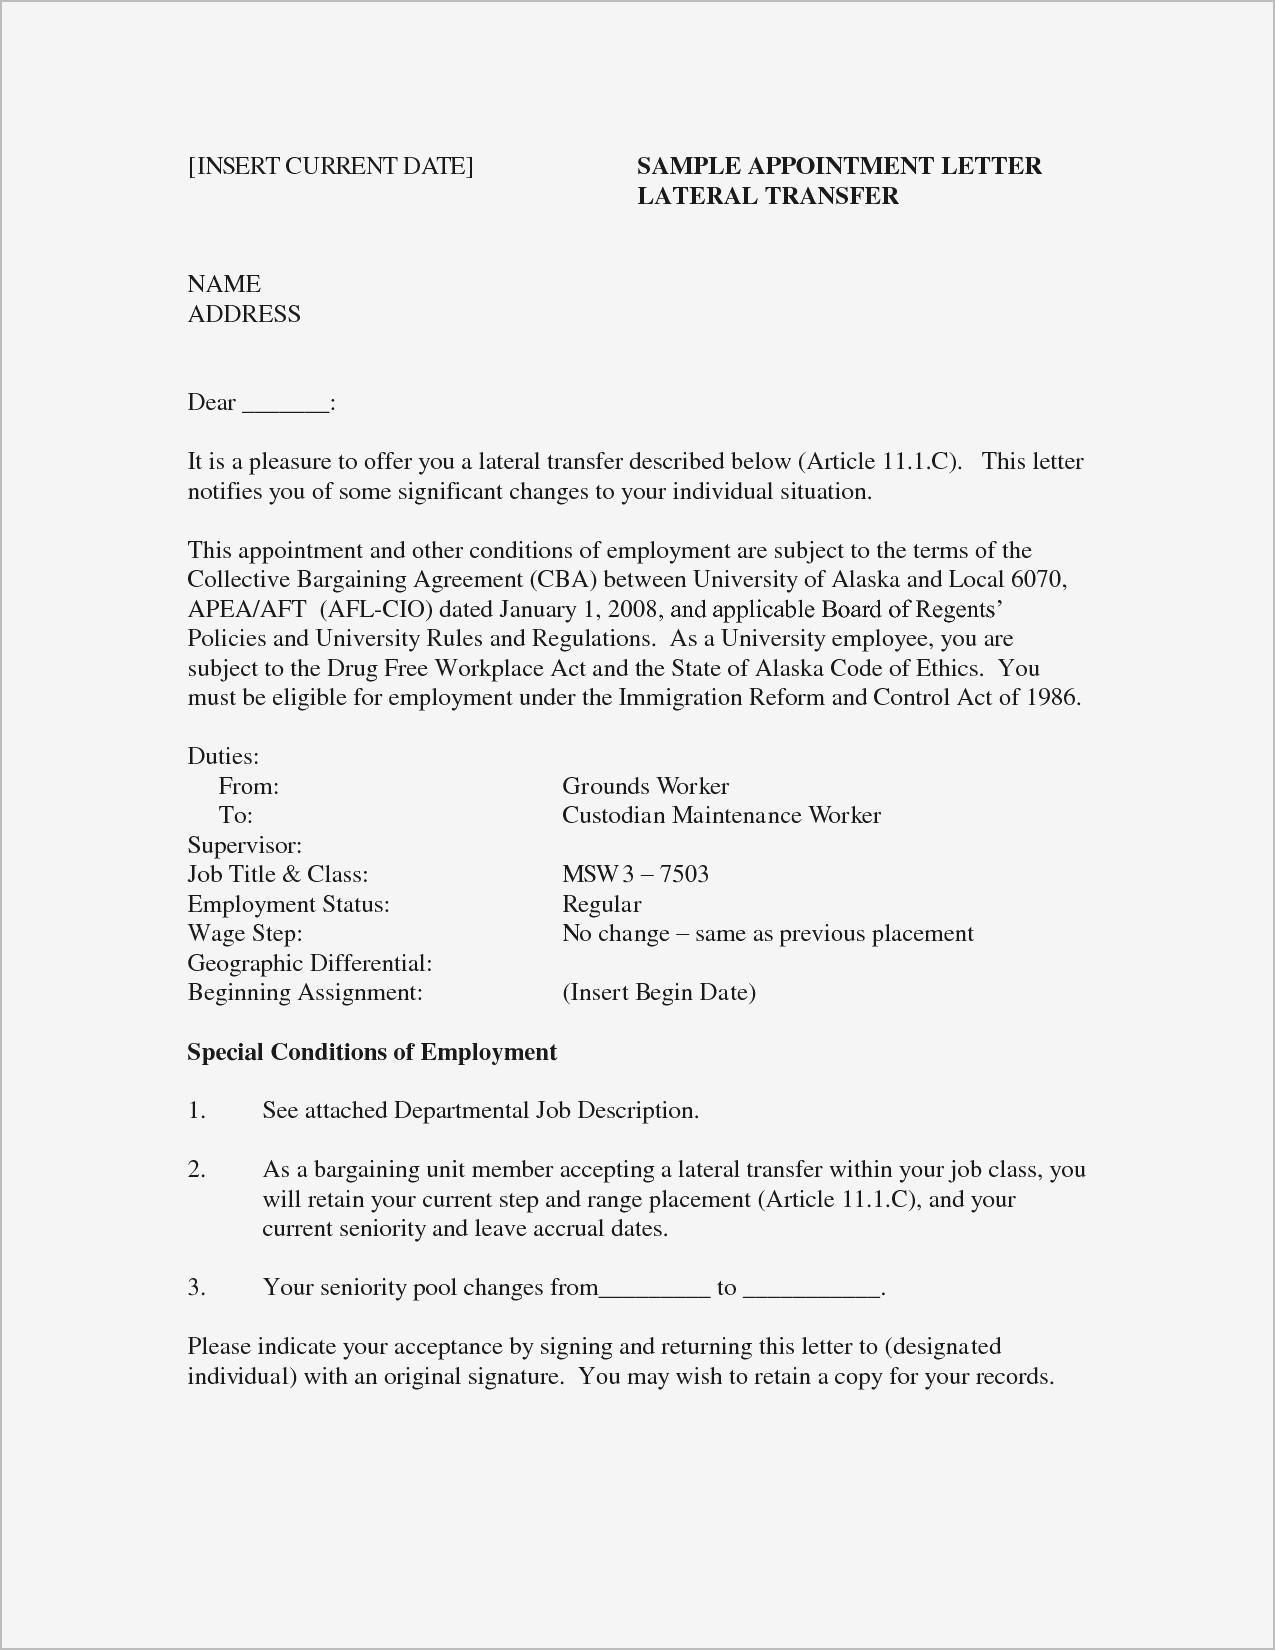 Work Offer Letter Template - Accepting A Job Fer Letter Valid Job Fer Letter Template Us Copy